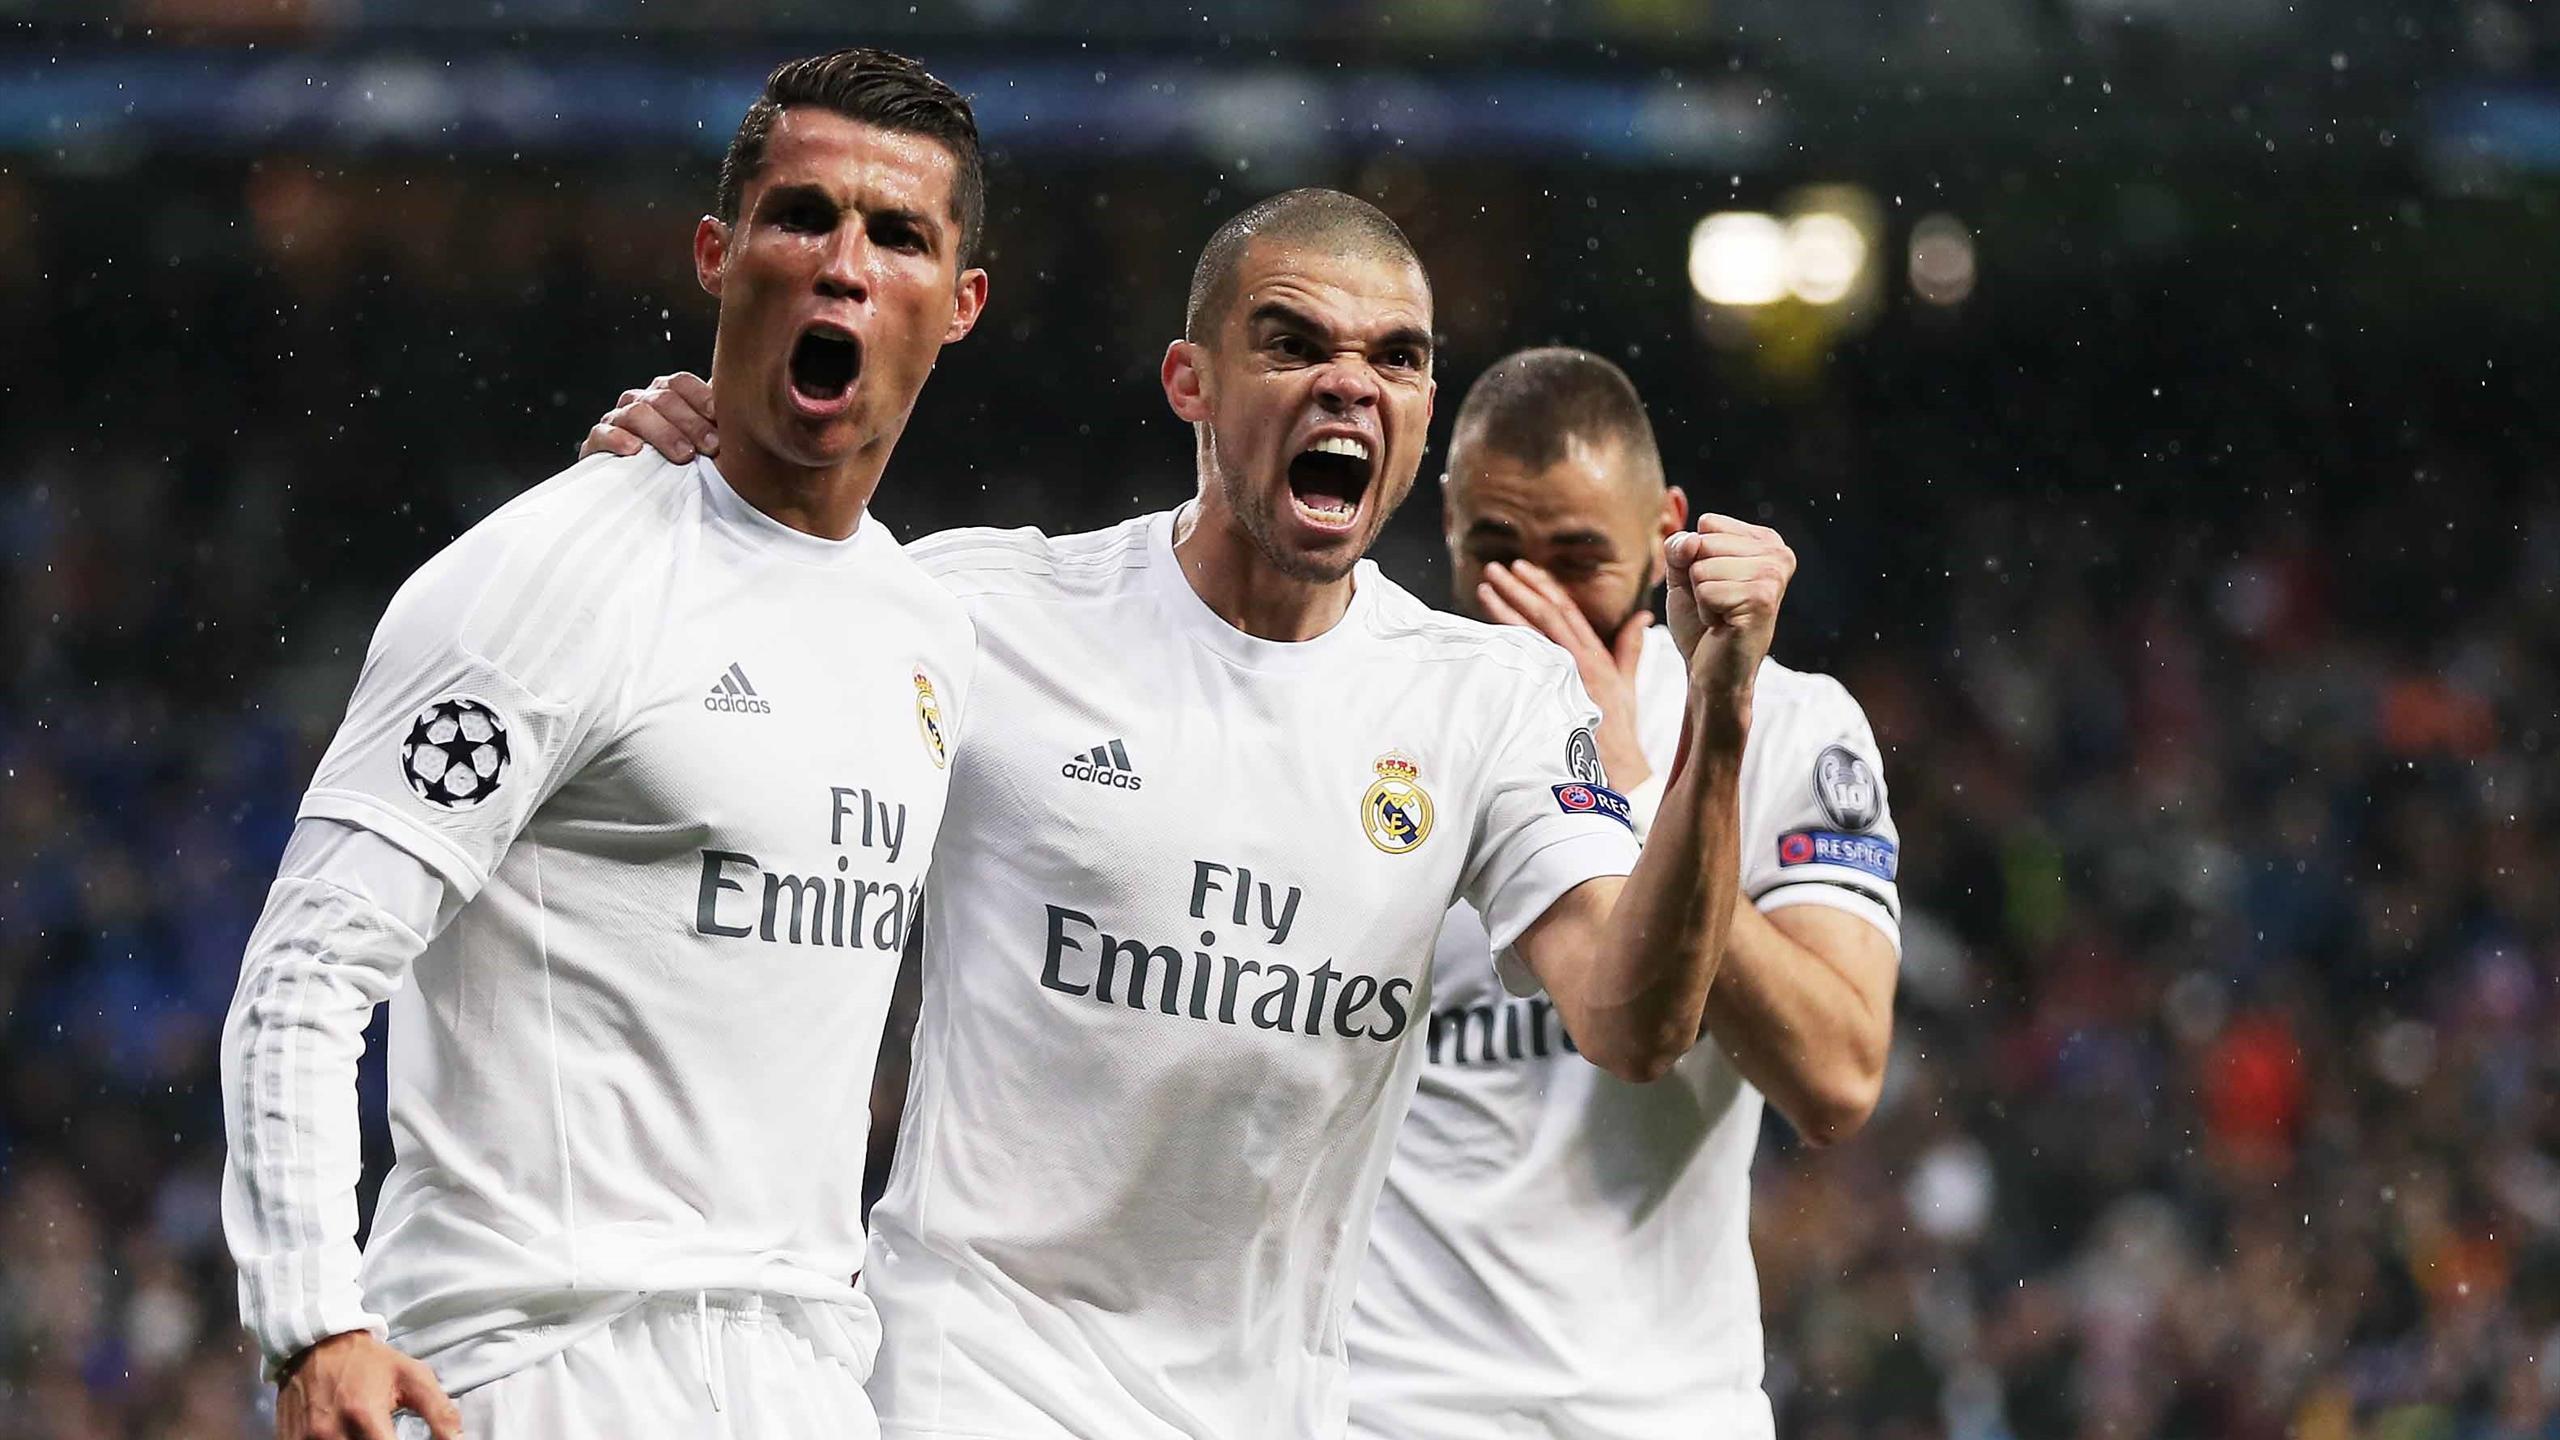 Cristiano Ronaldo, Pepe and Karim Benzema célébrant un but avec le Real Madrid